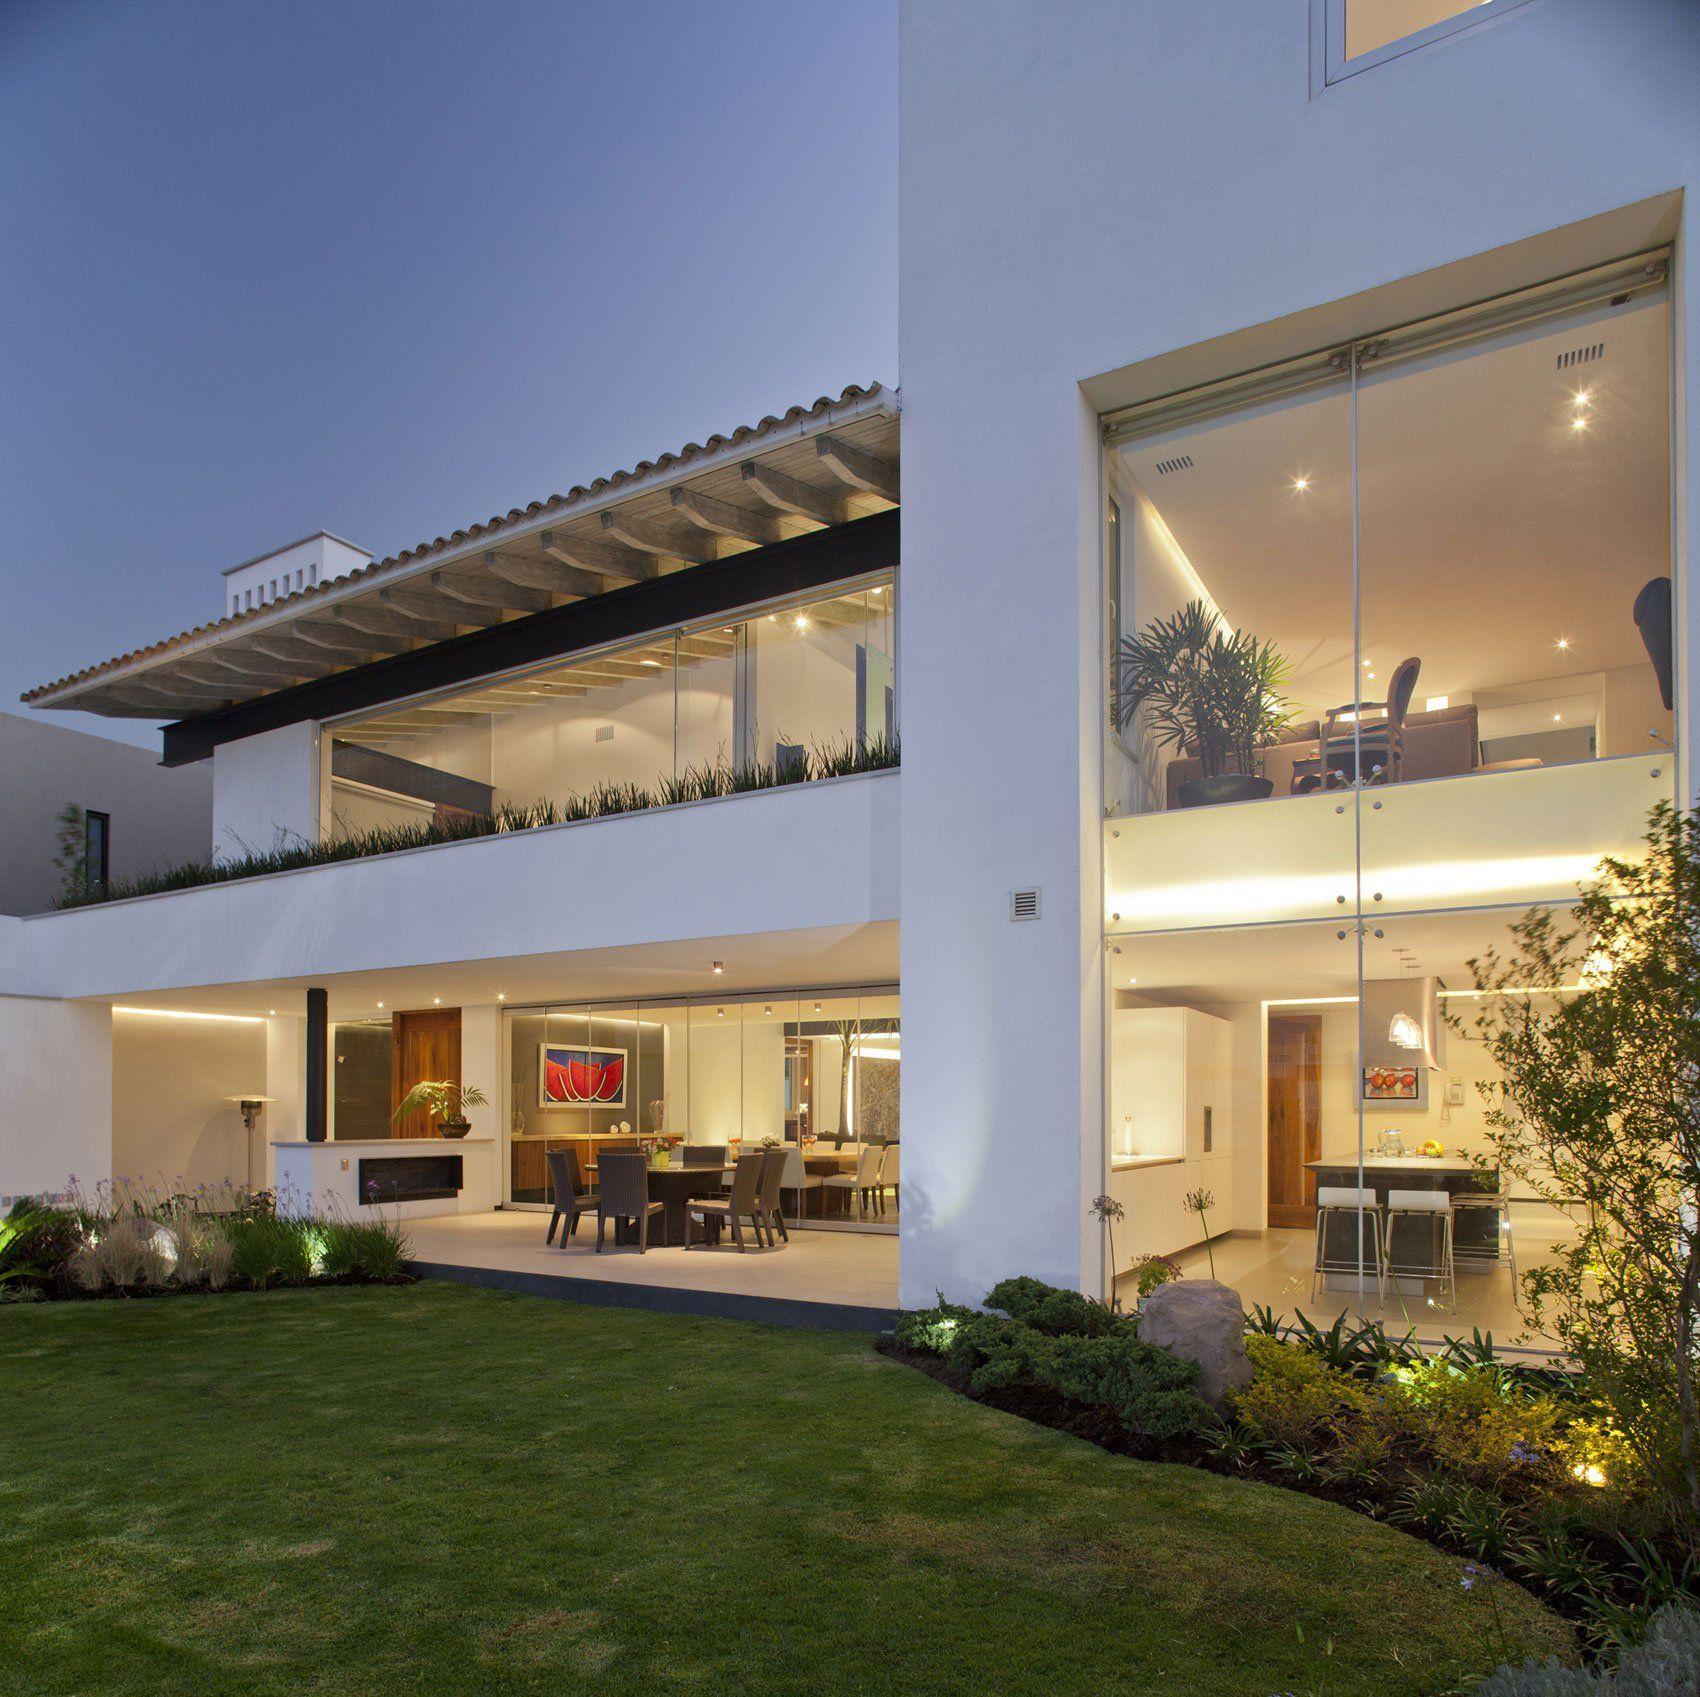 Casa Rio Hondo By A A A Almazan Y Arquitectos Asociados Caandesign Architecture And Home Design Blog Architecture Architecture Design Modern Architecture